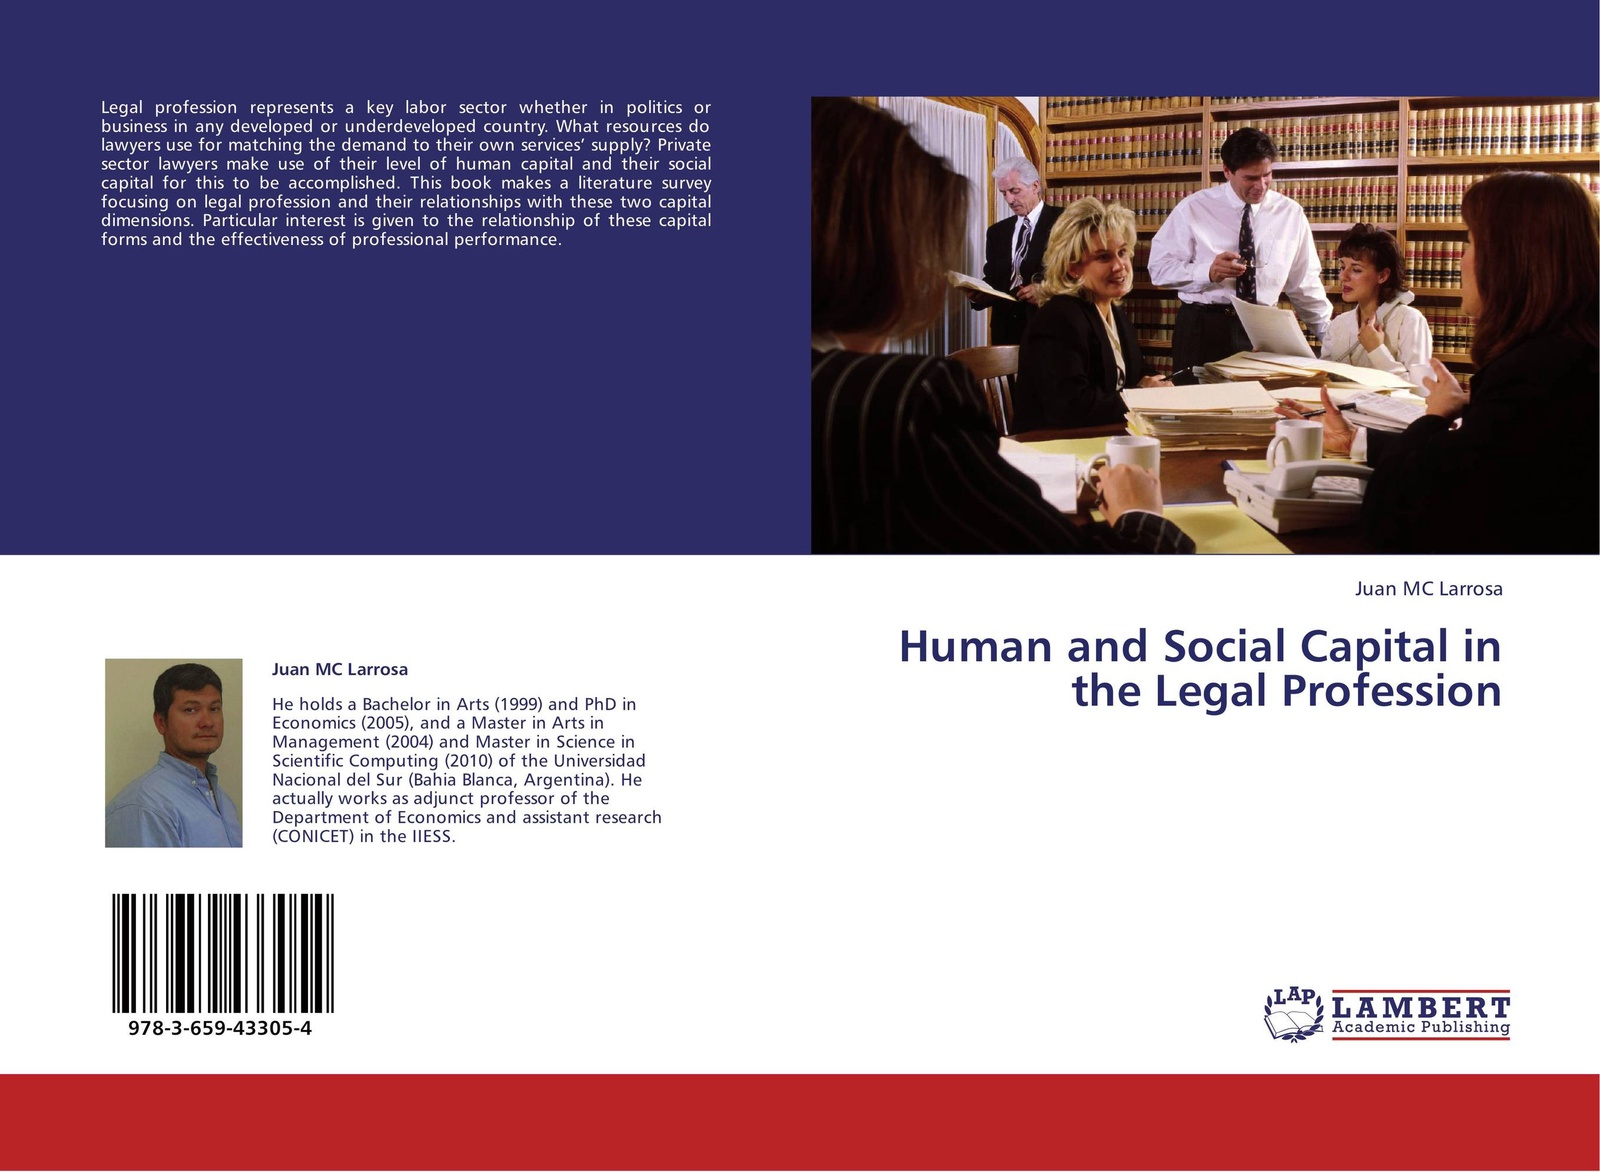 Juan MC Larrosa Human and Social Capital in the Legal Profession juan ramirez handbook of basel iii capital enhancing bank capital in practice